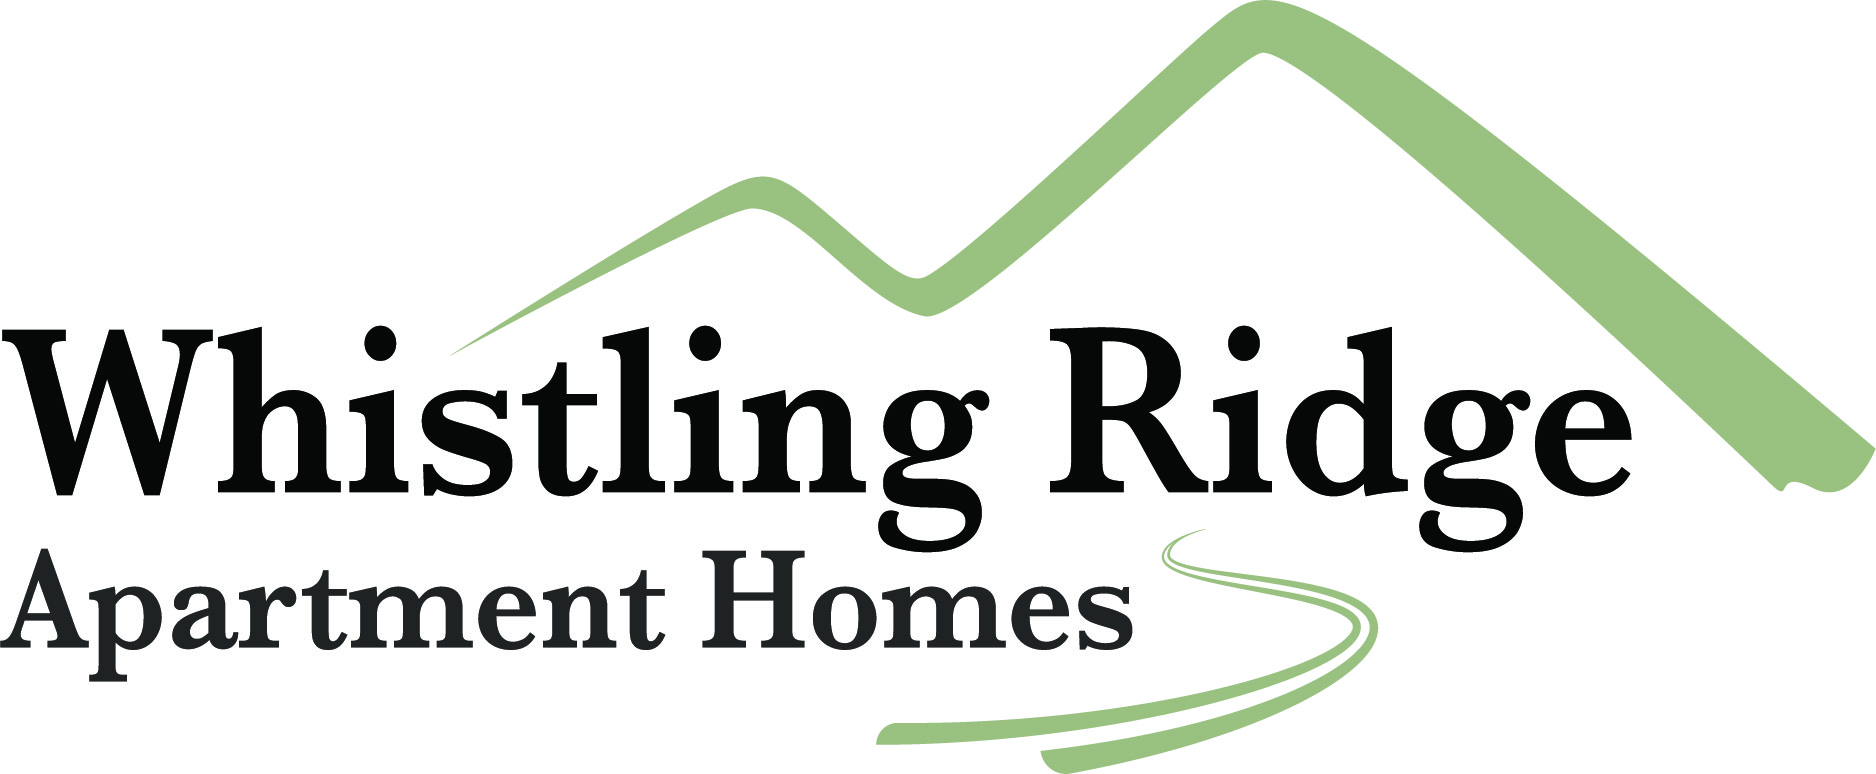 Whistling Ridge Apartments